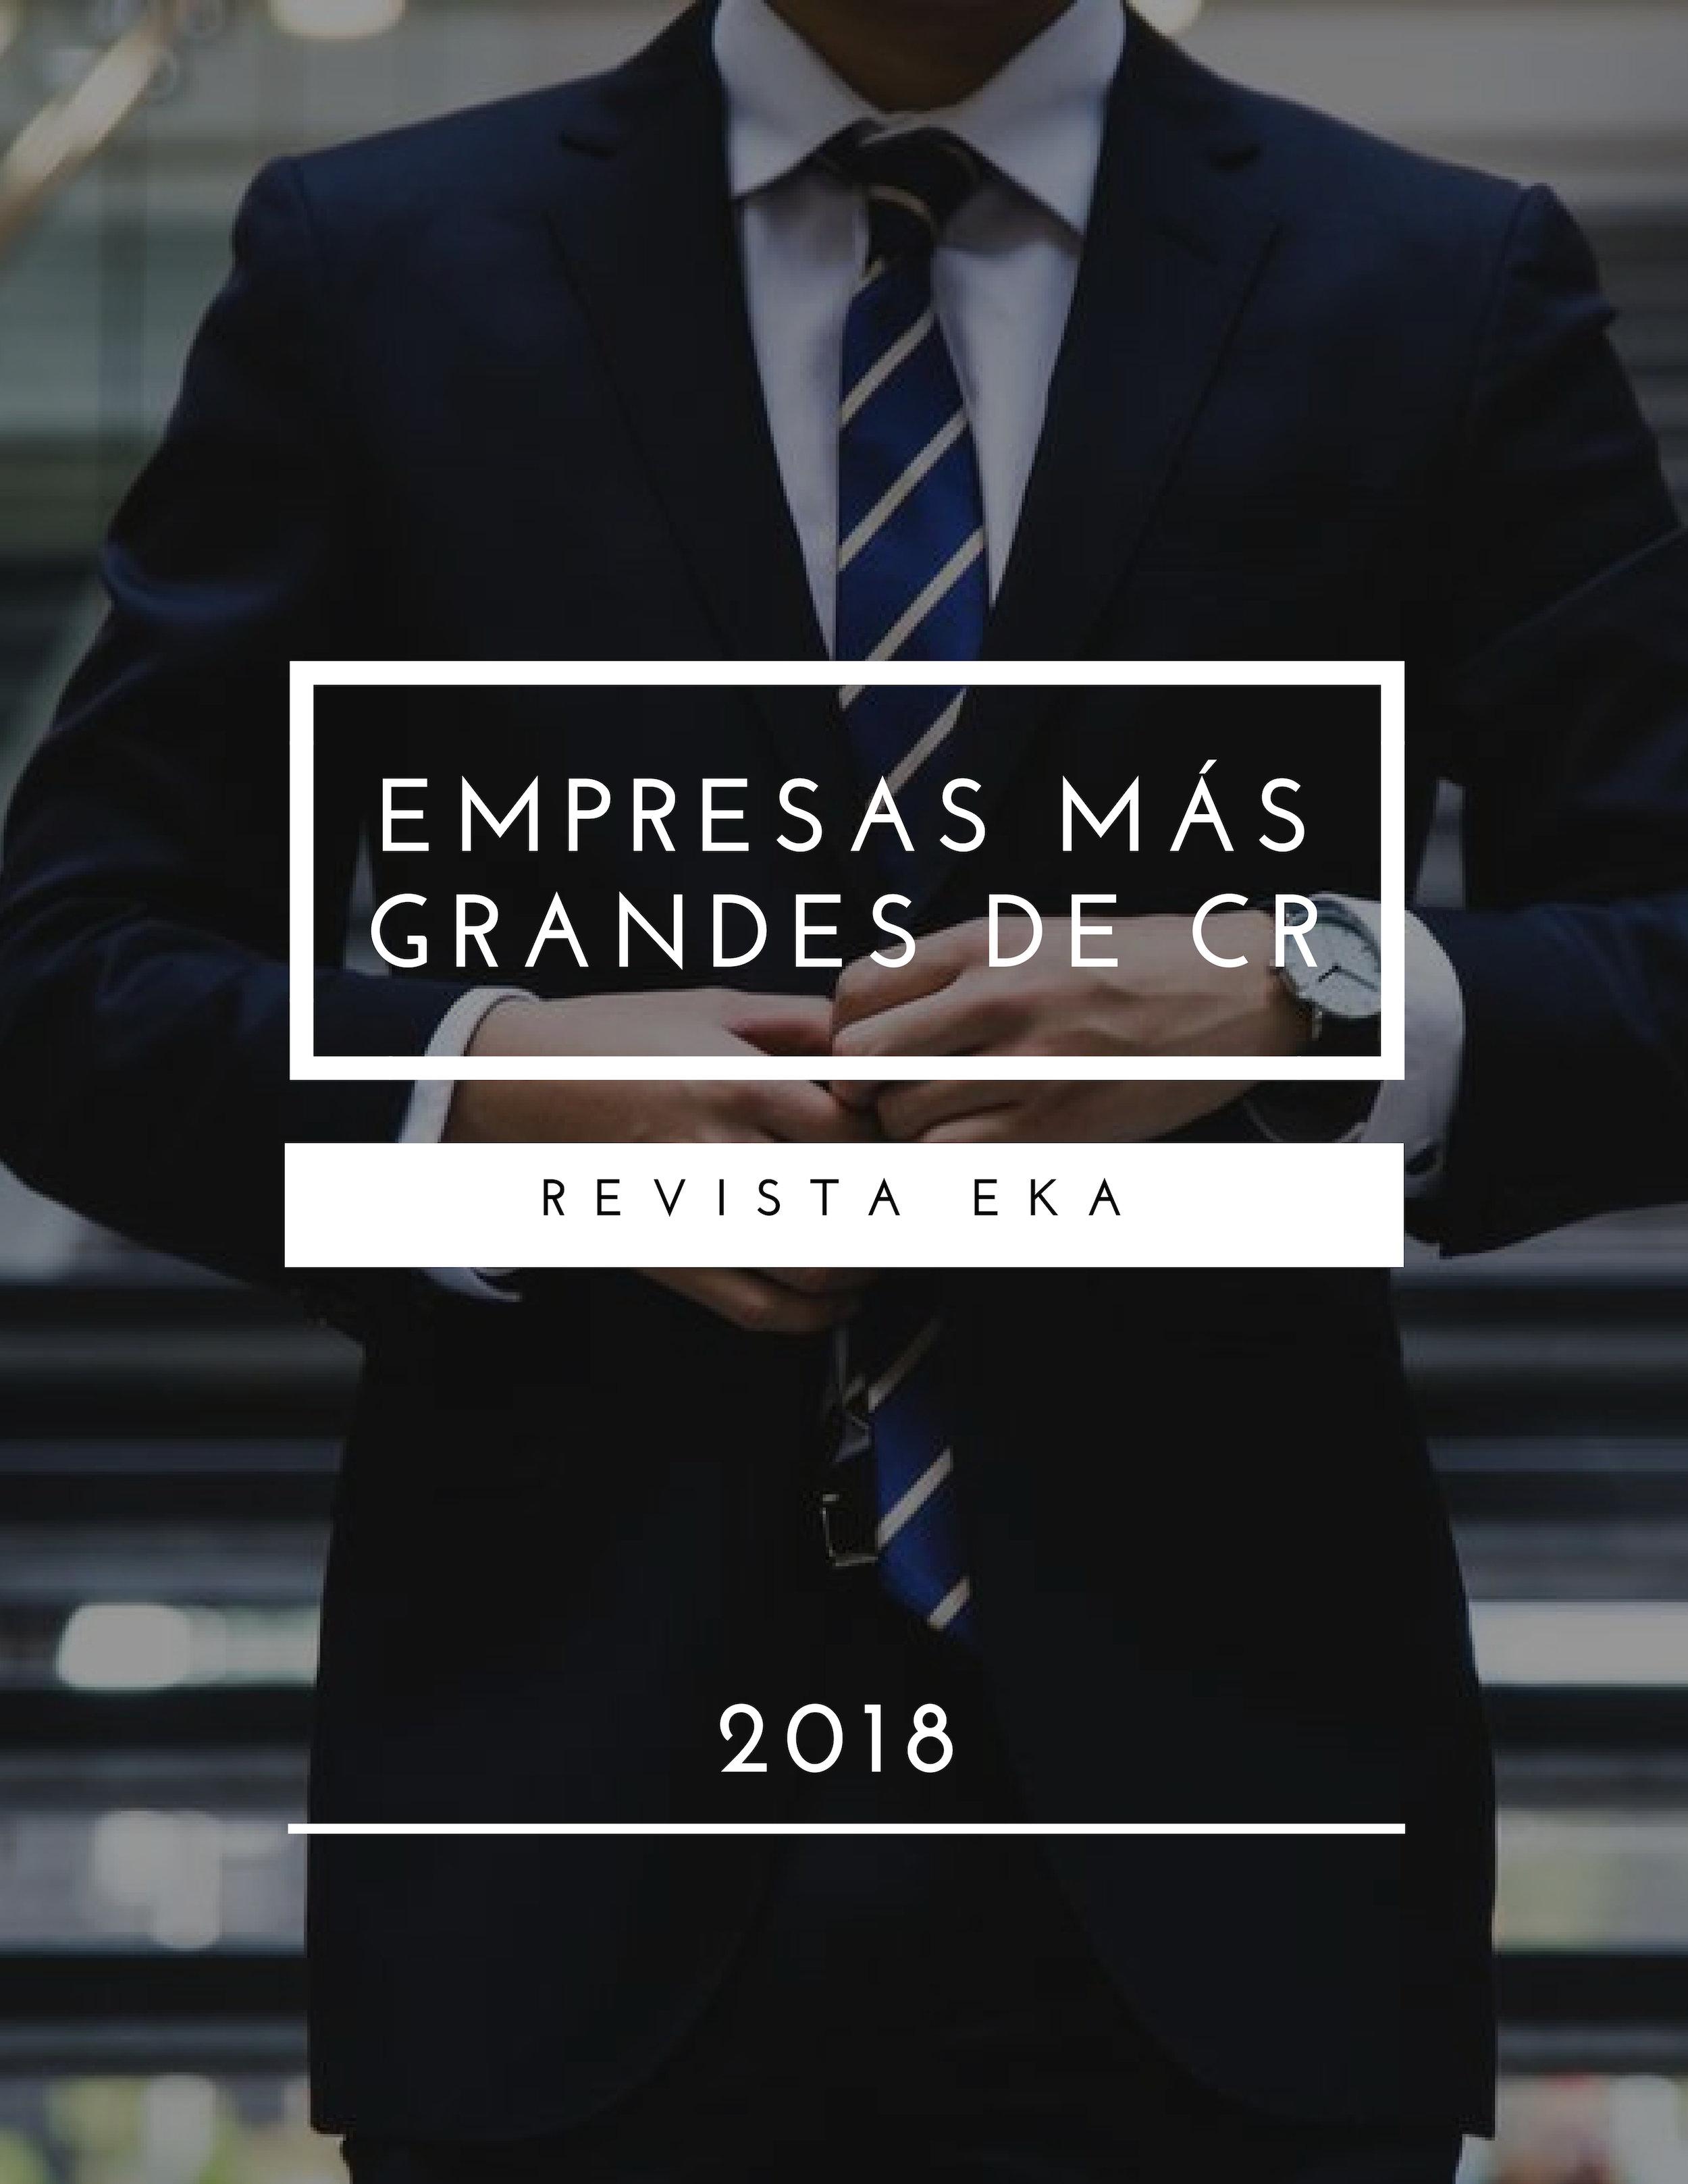 https://ekaenlinea.com/wp-content/uploads/2018/12/Empresasmásgrandes.jpg